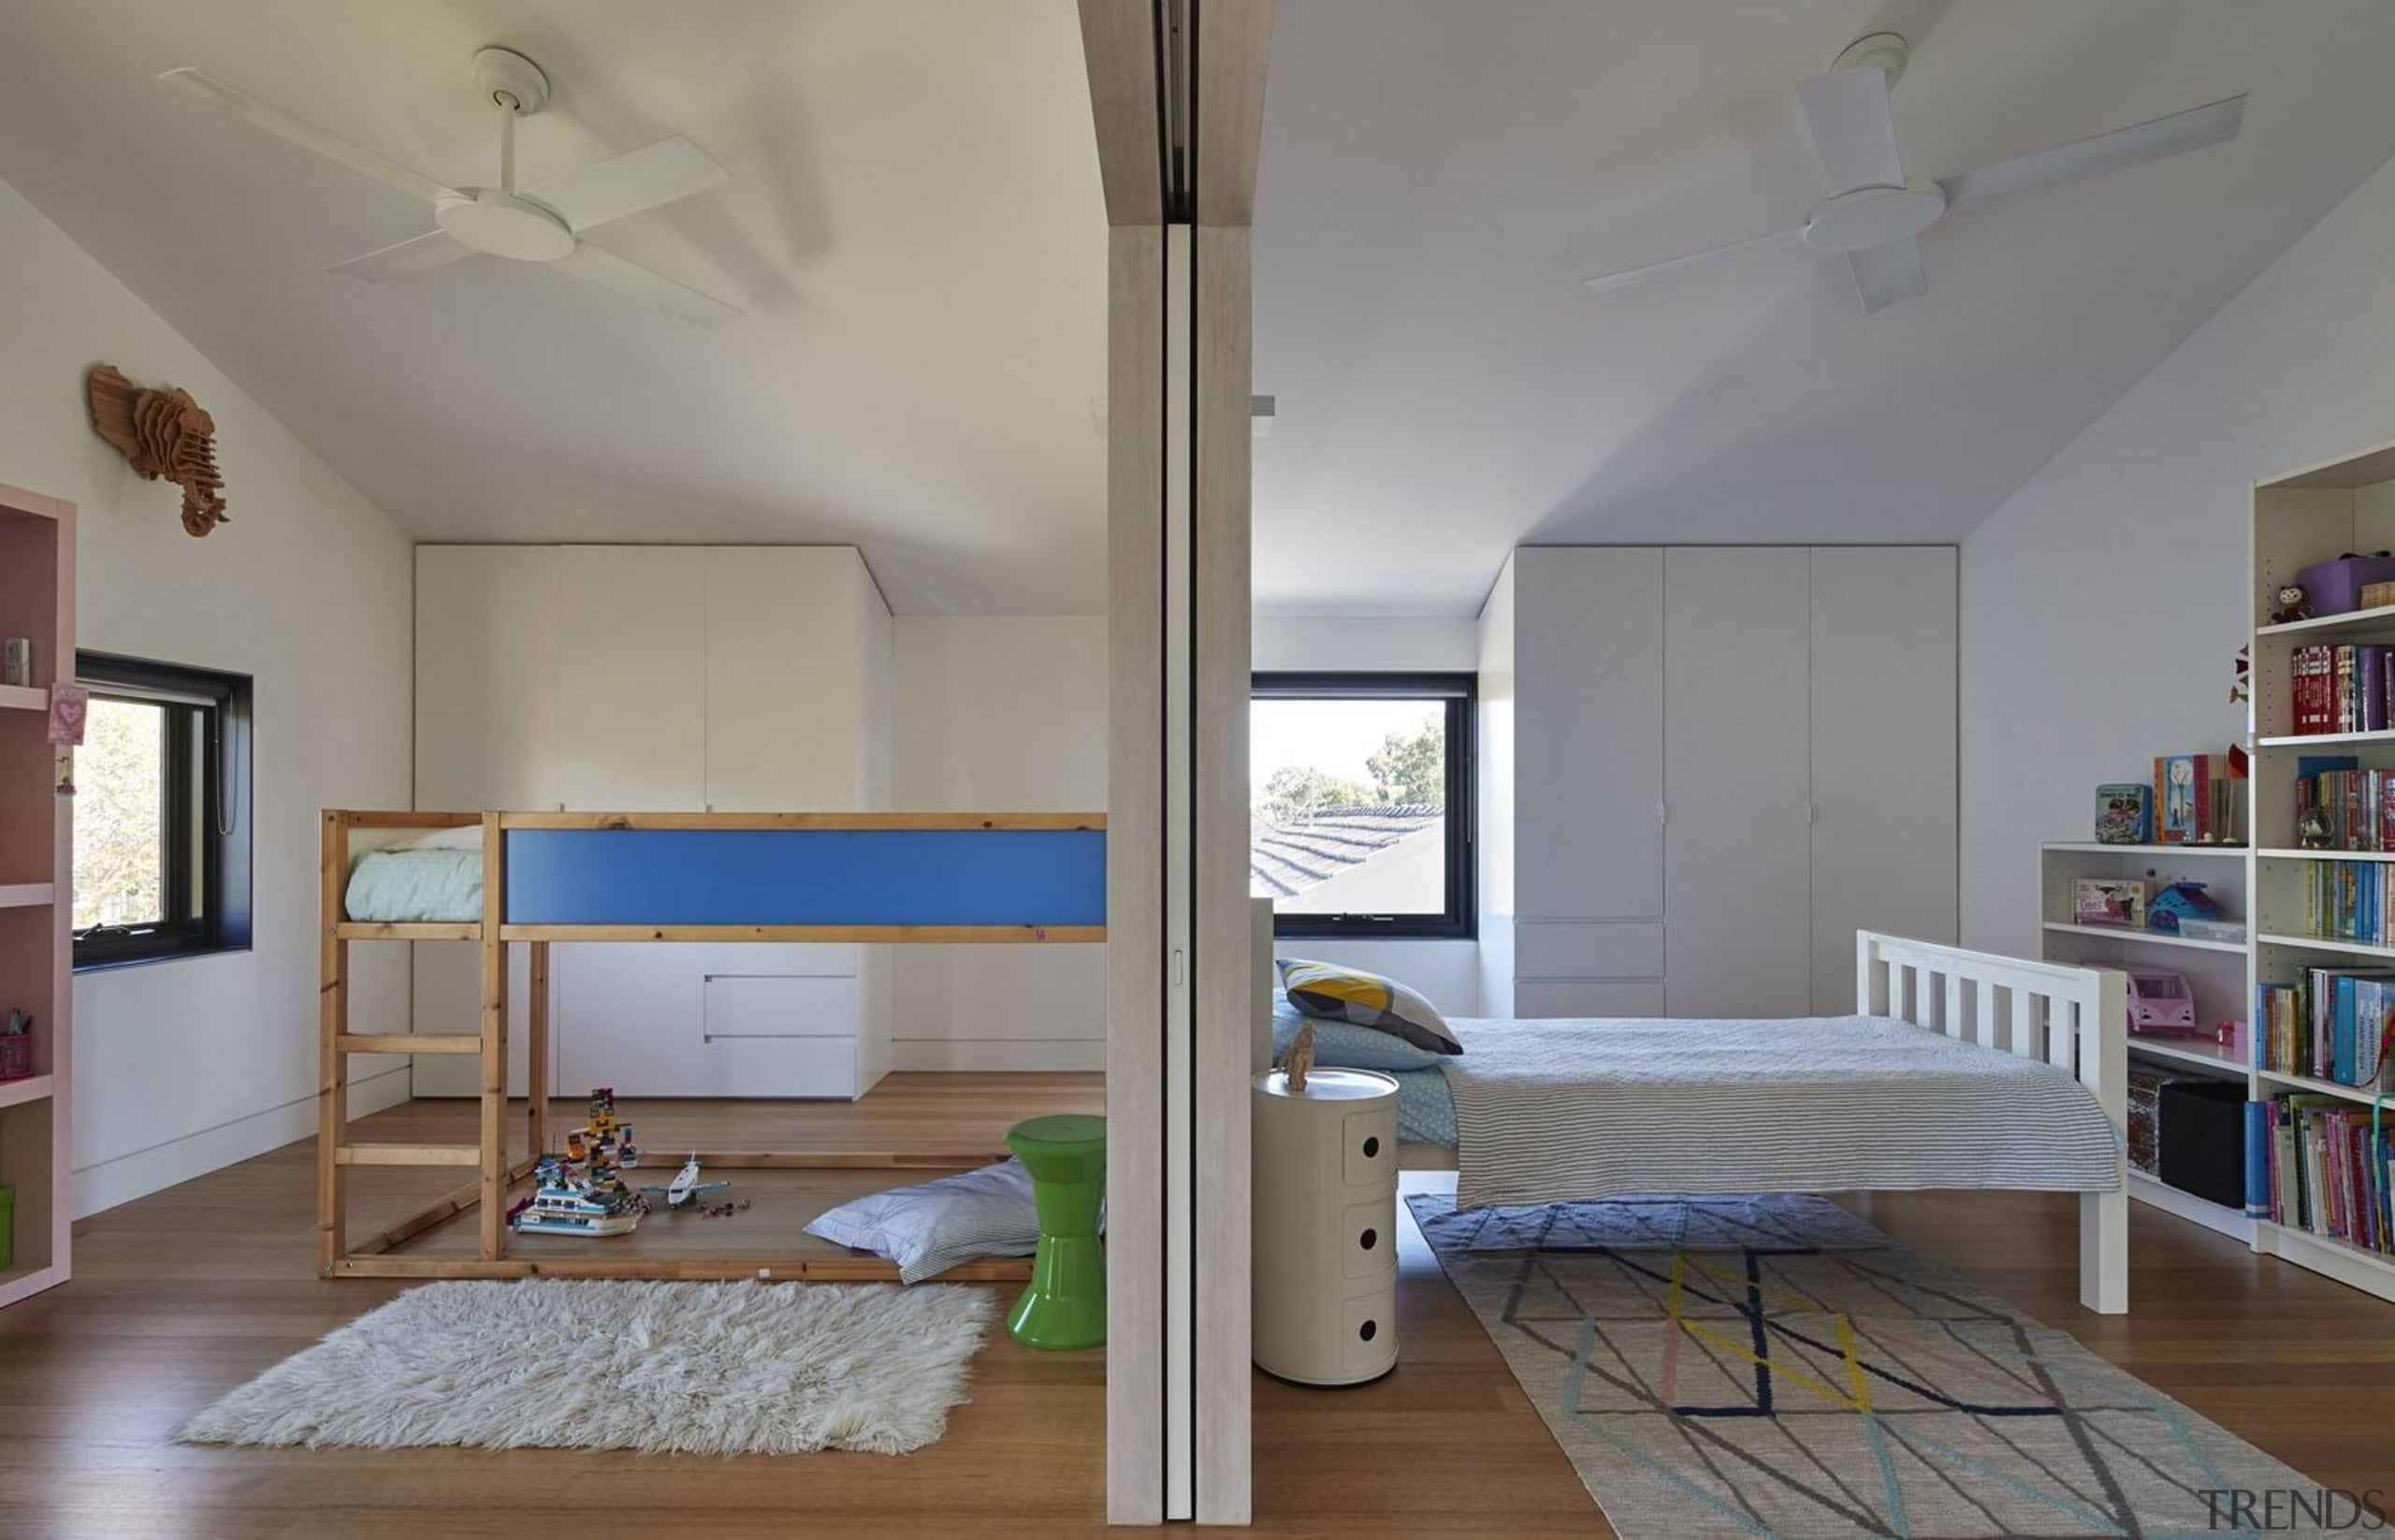 Architect: Austin Maynard ArchitectsPhotography by Peter Bennetts architecture, ceiling, daylighting, floor, furniture, house, interior design, living room, loft, real estate, room, gray